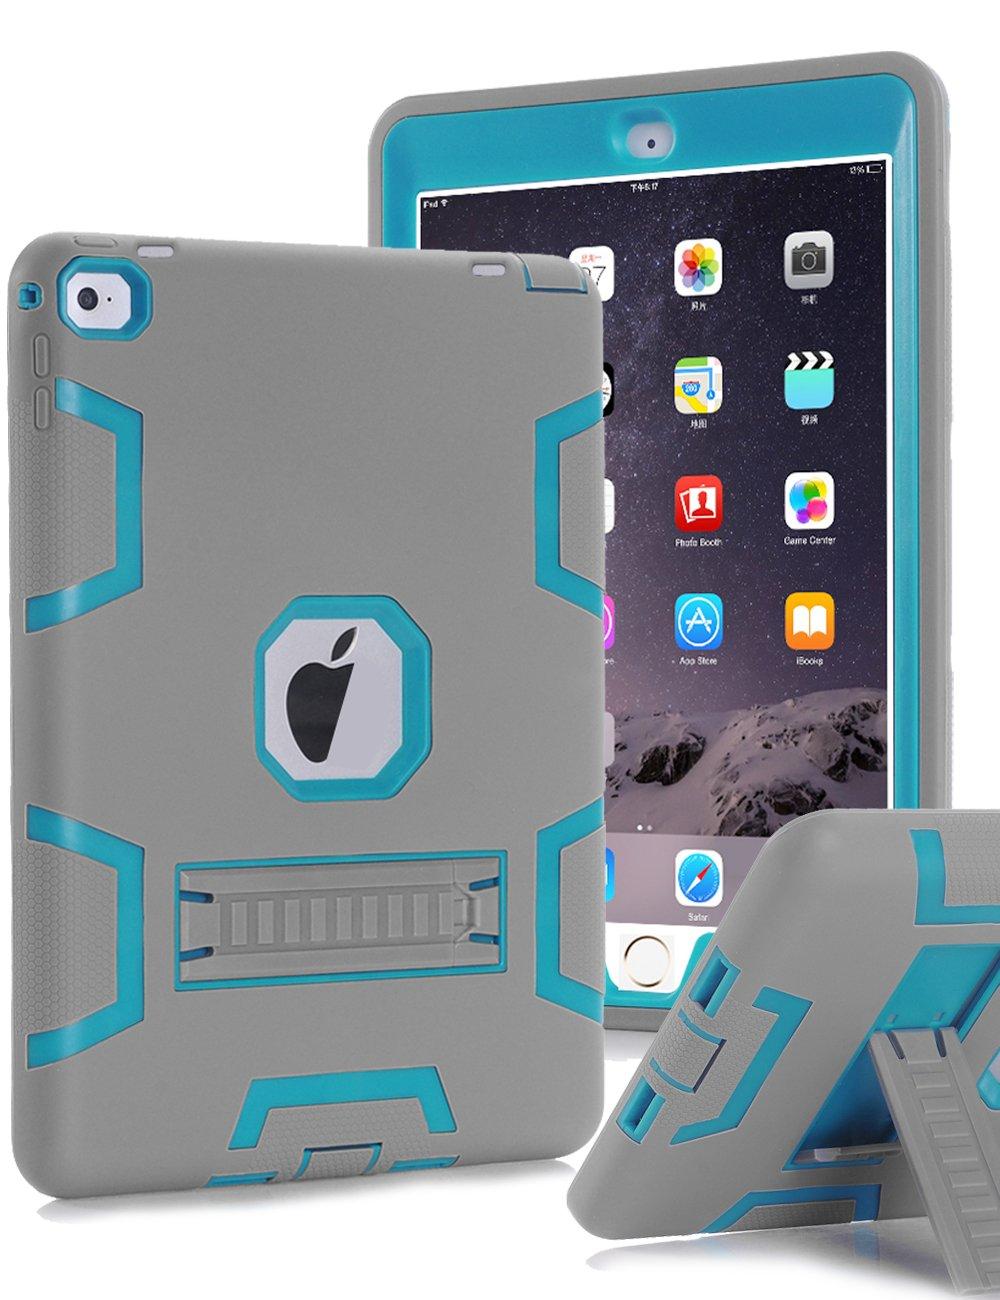 Best Ipad 2020 Case Top 20 Best Apple iPad Pro Impact Resistant Case Covers 2019 2020